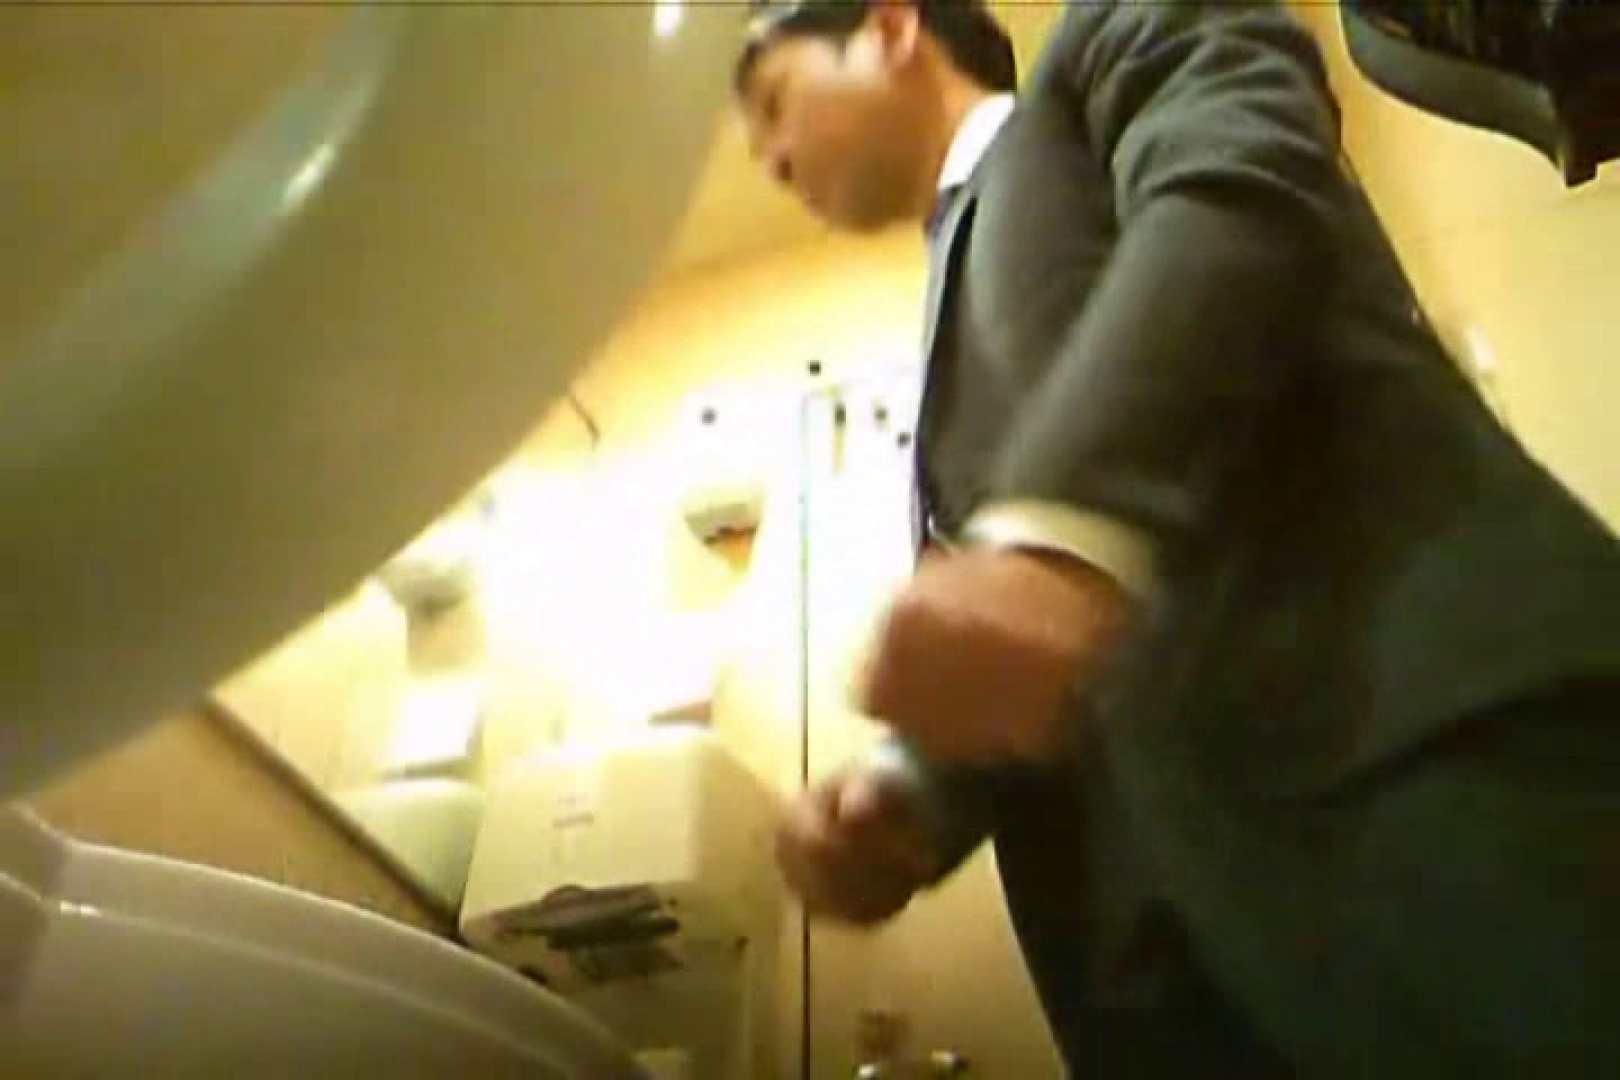 SEASON 2ND!掴み取りさんの洗面所覗き!in新幹線!VOL.06 男子のお尻  87枚 30